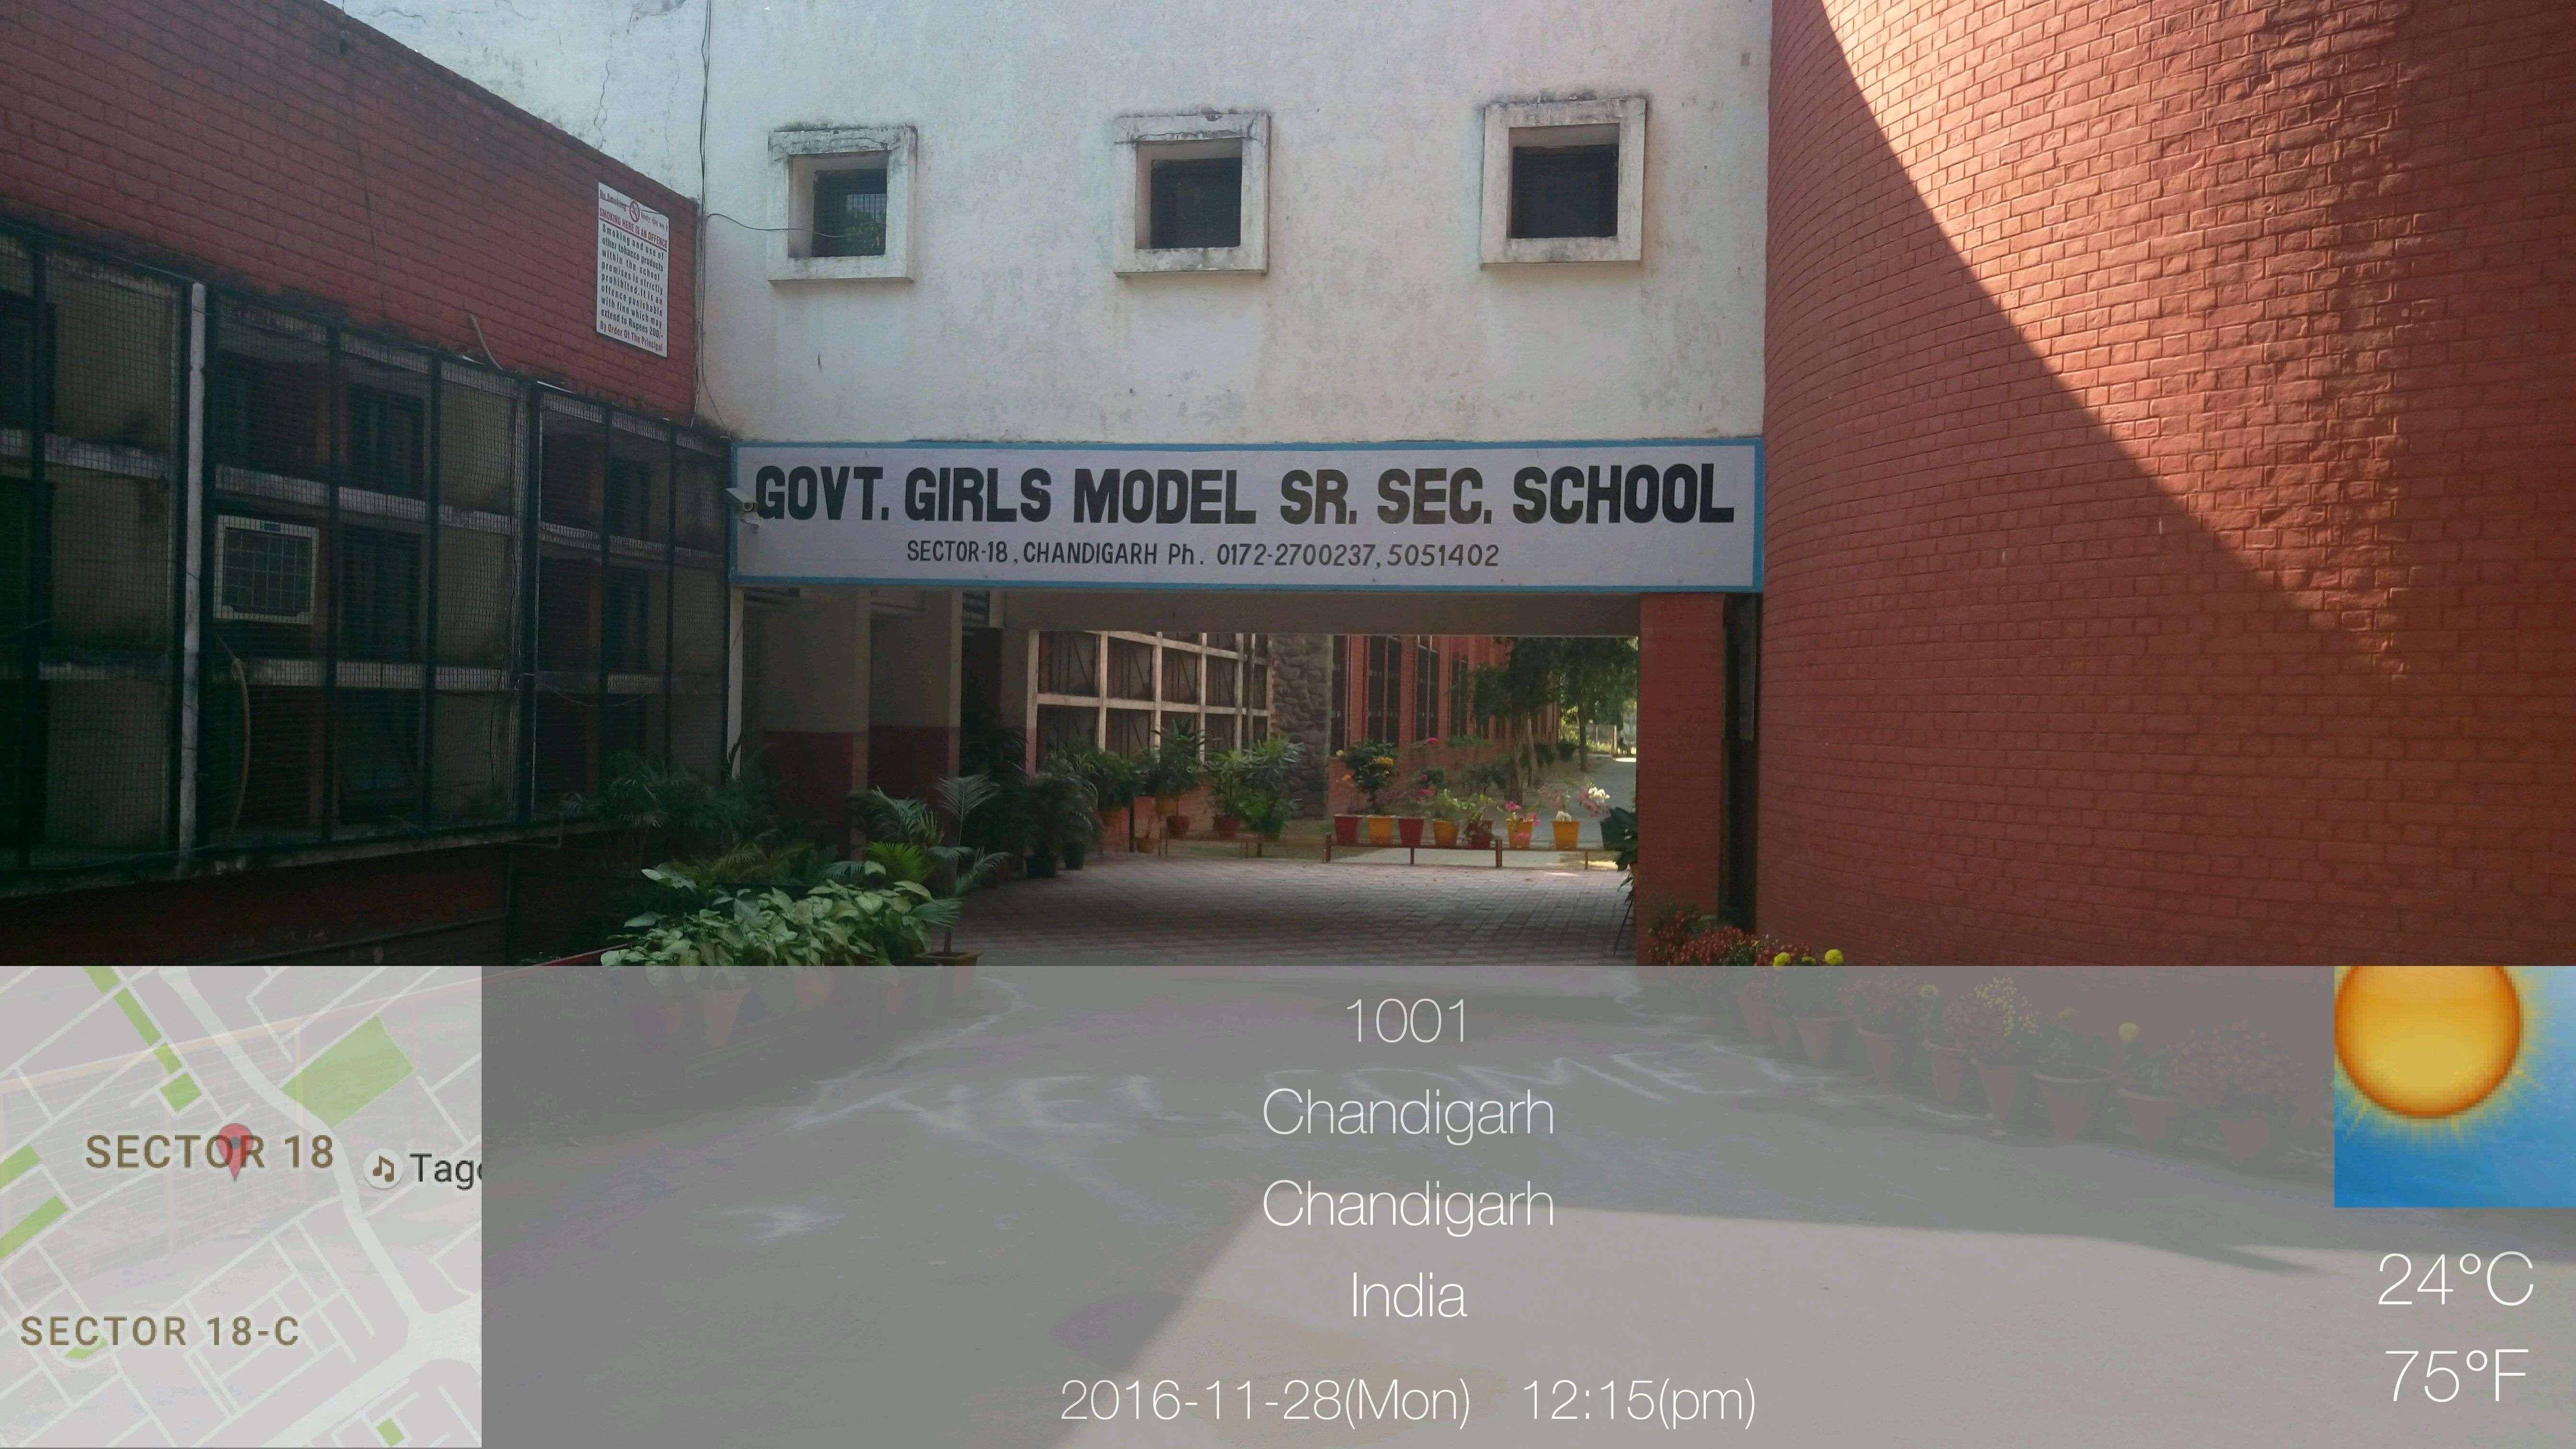 GOVT GIRLS SR SEC SCHOOL SECTOR 18 C CHANDIGARH 2620008